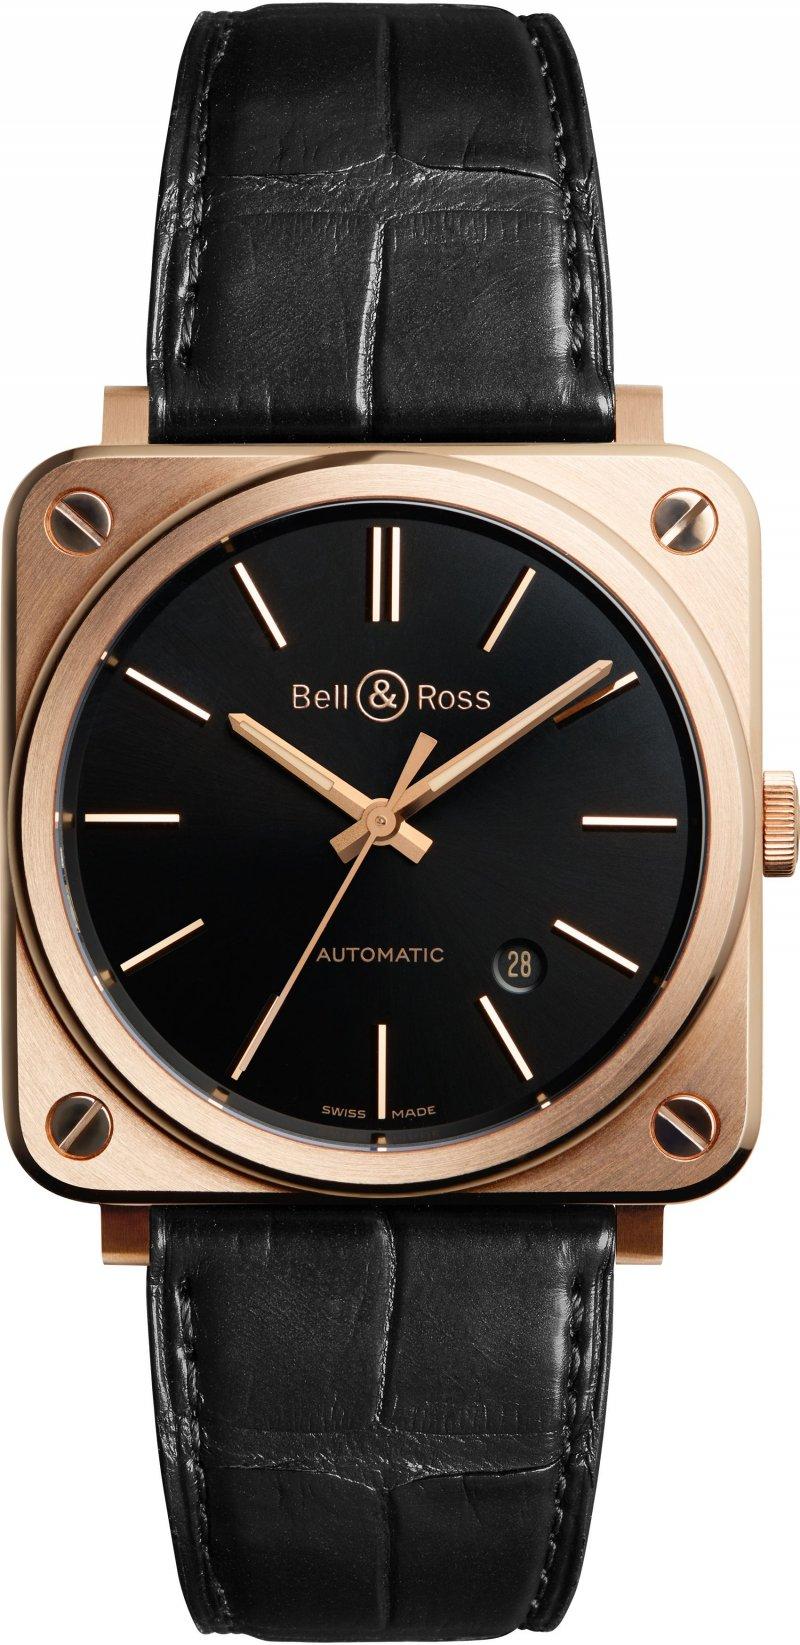 Bell & Ross透過一點點恰當的懷舊筆觸,涵蓋了具有真正價值的男人世界。(圖/Bell & Ross提供)